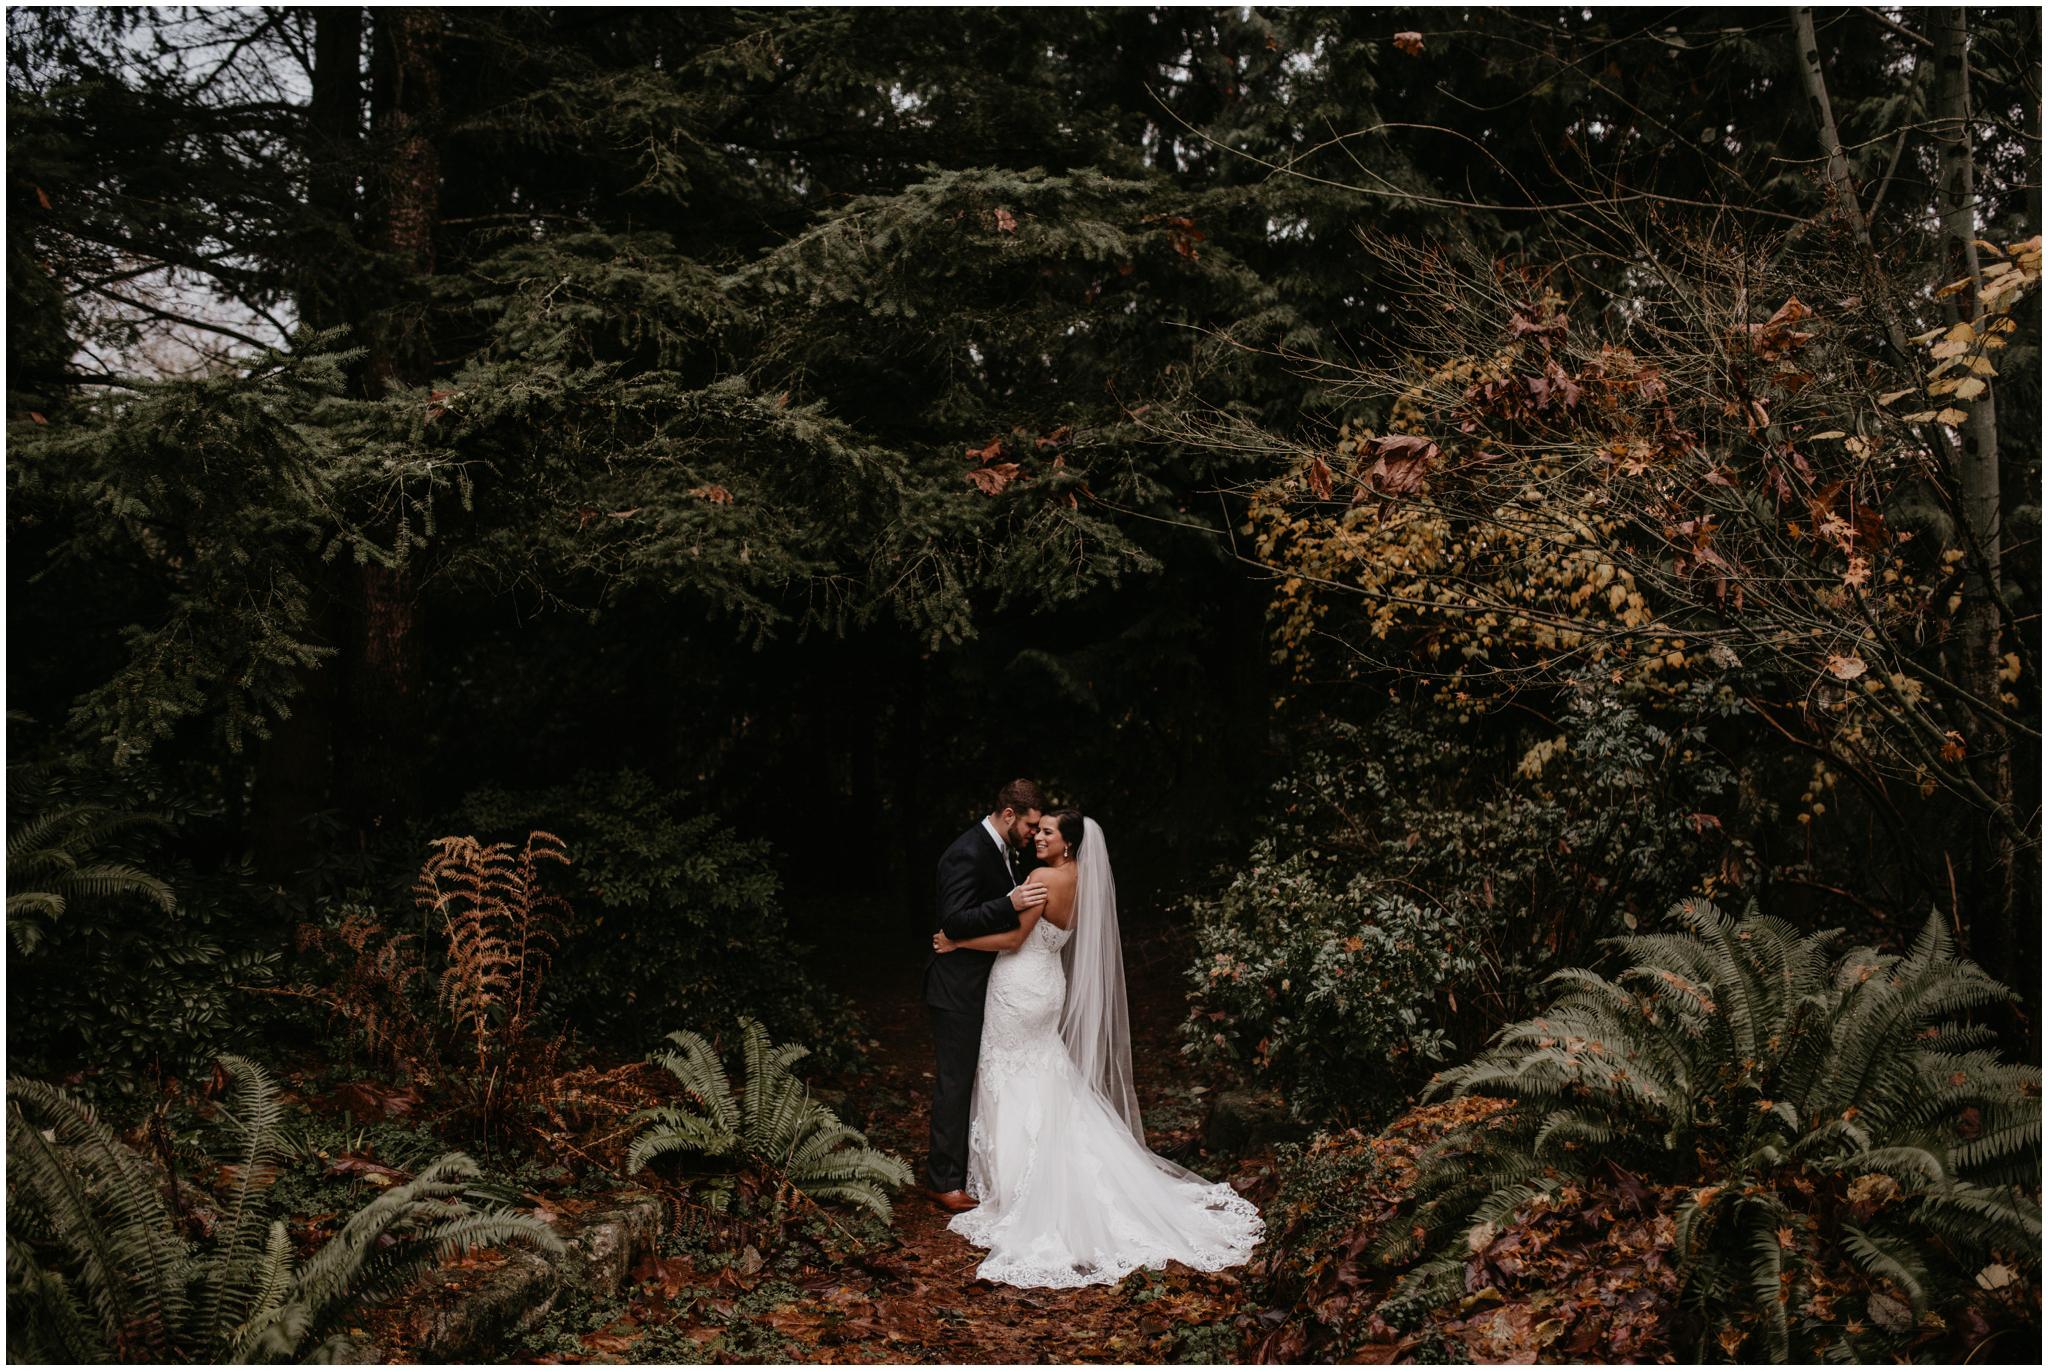 ashley-tj-the-pickering-barn-winter-wedding-seattle-photographer-055.jpg